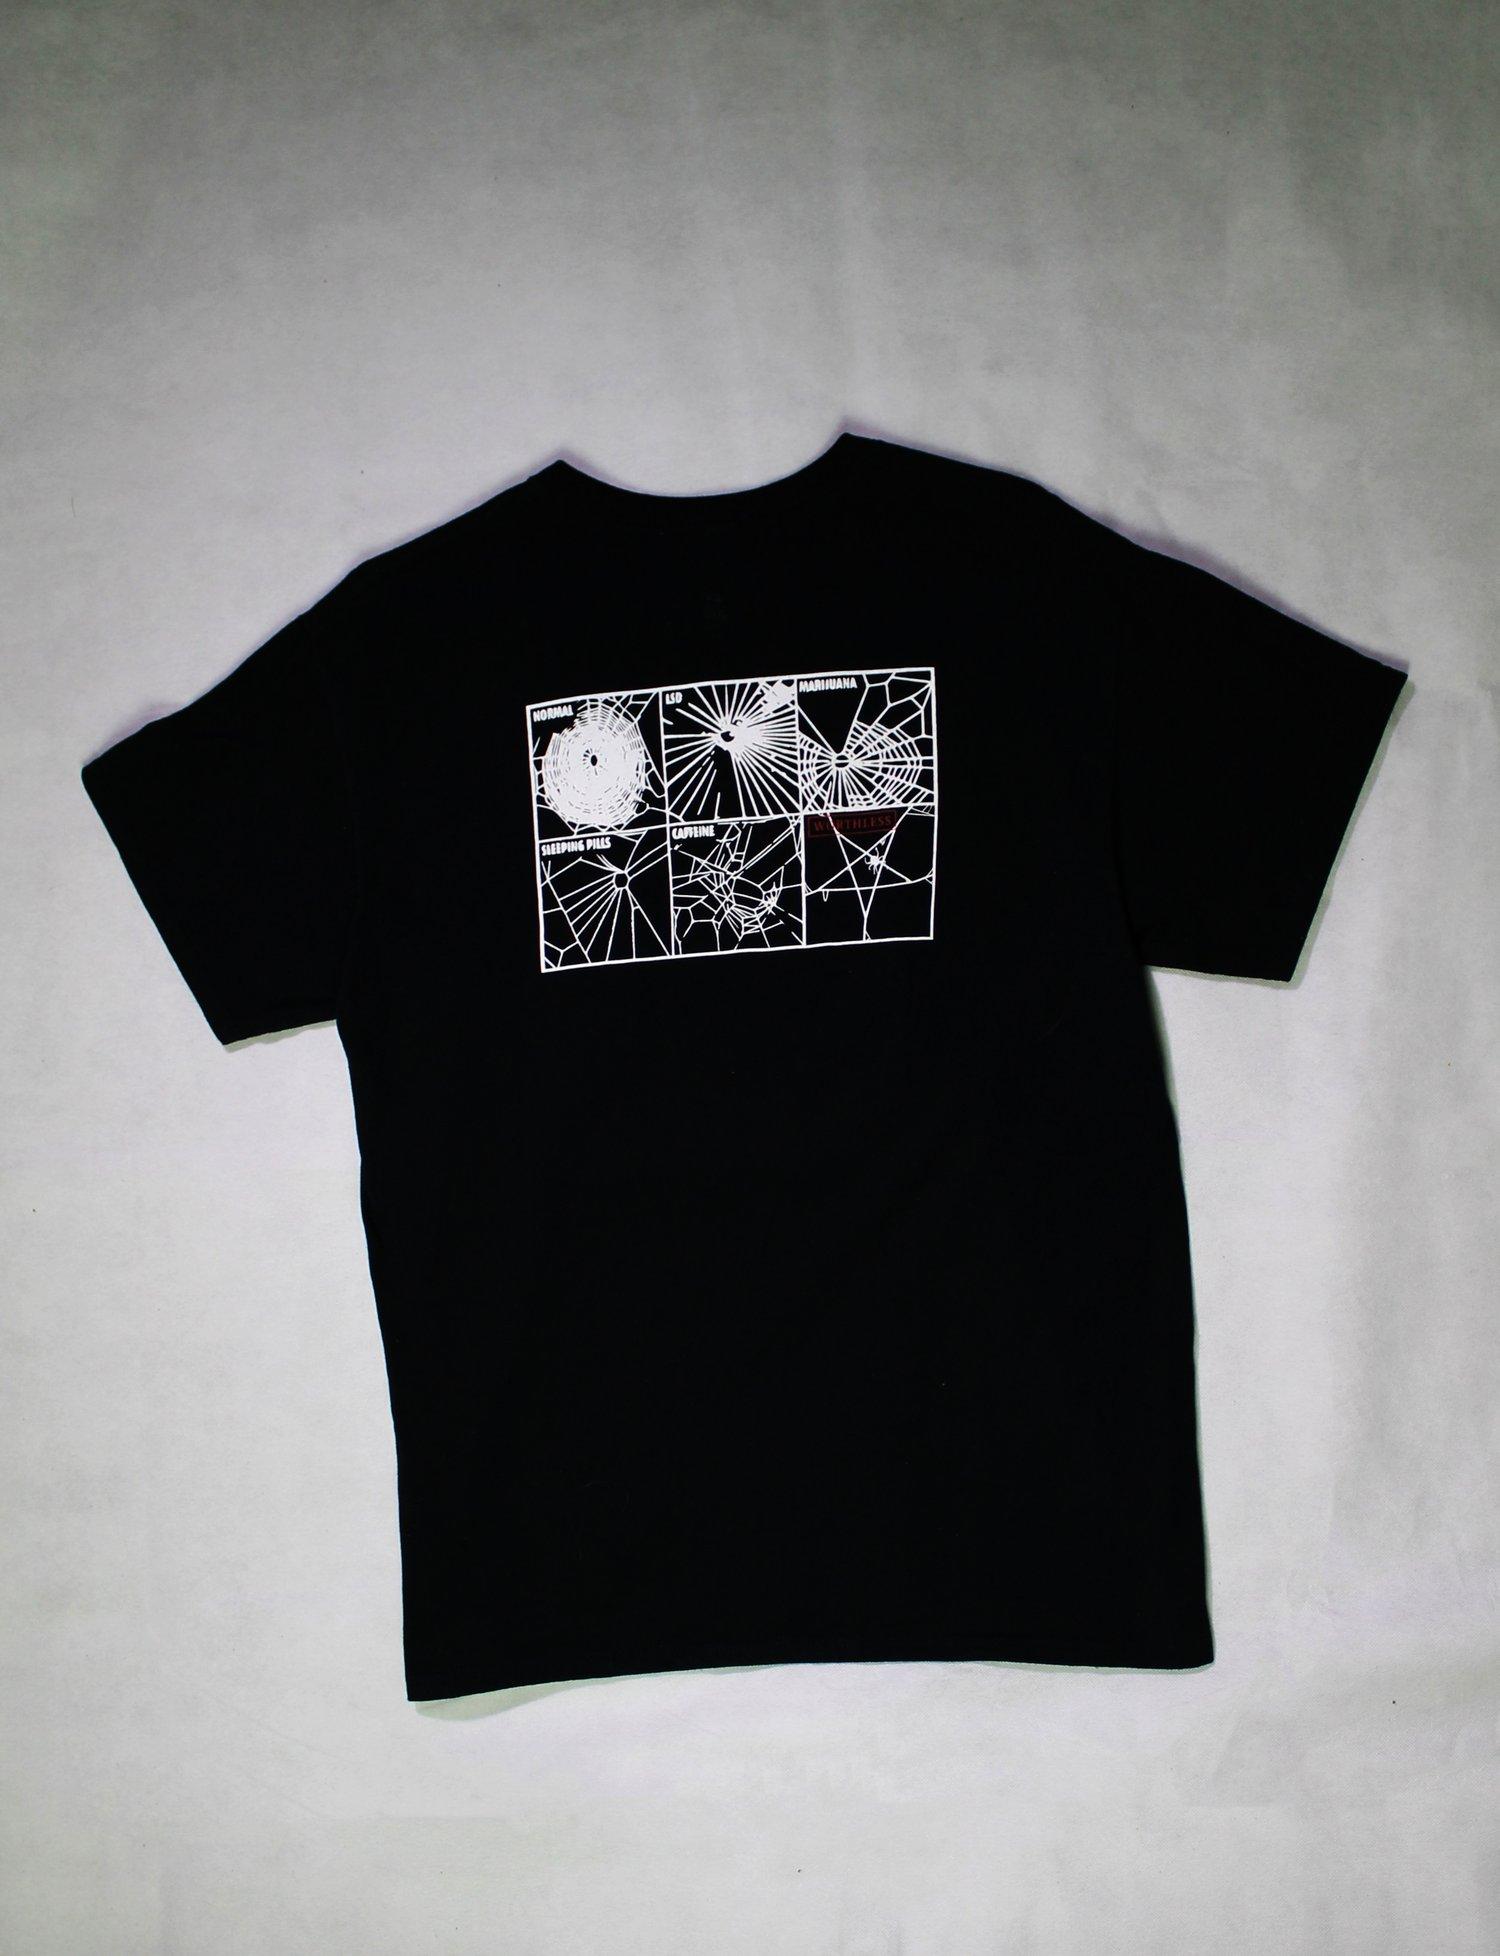 Spider Experiment Shirt